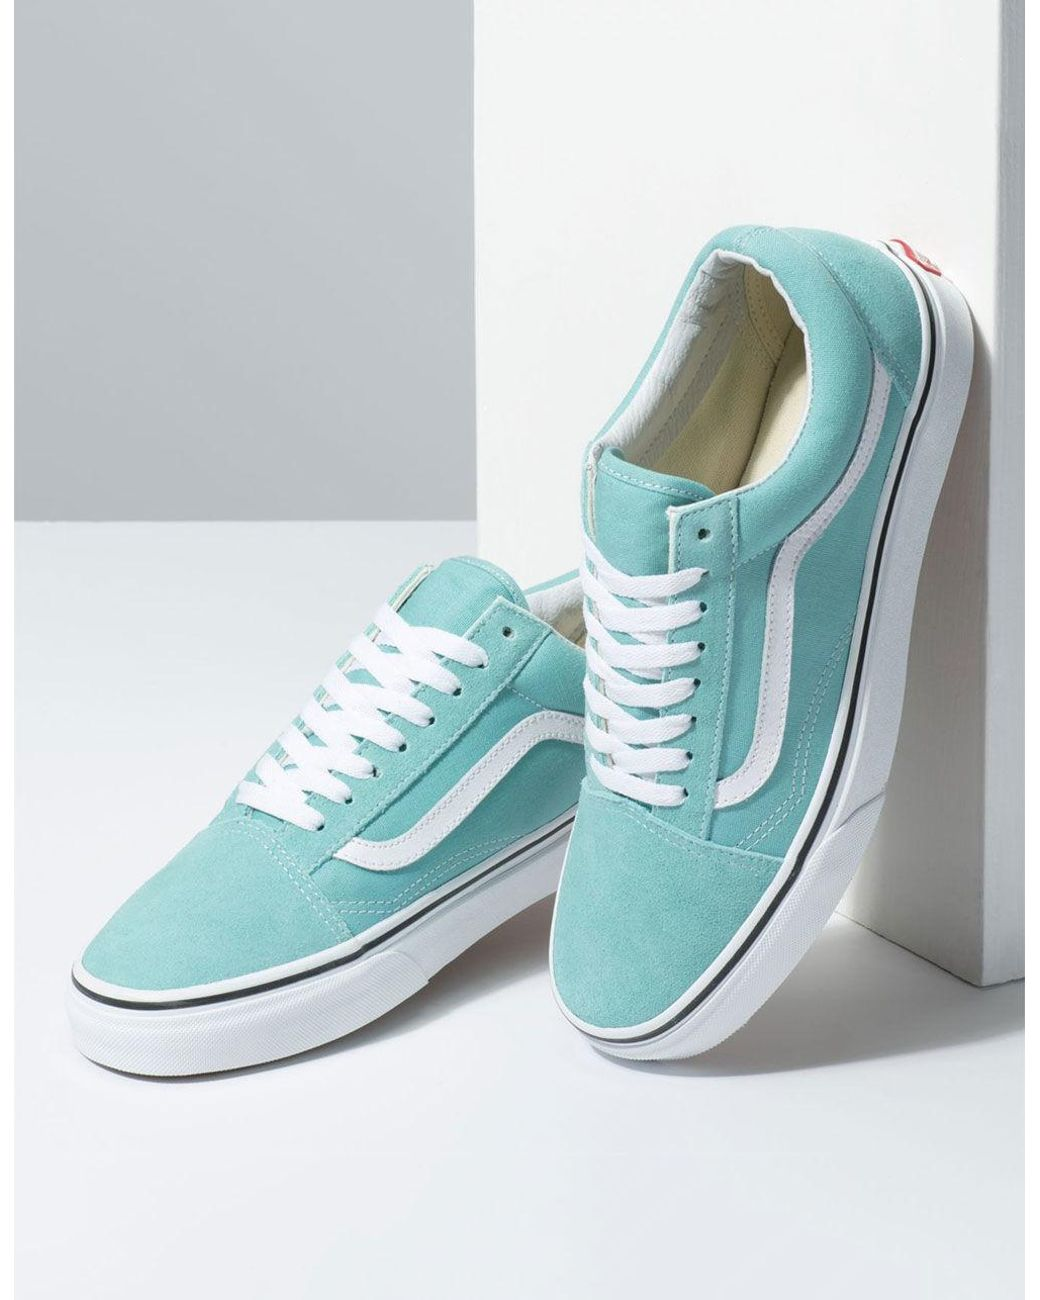 22dfe08beb1 Vans Old Skool Aqua Haze & True White Shoes - Lyst